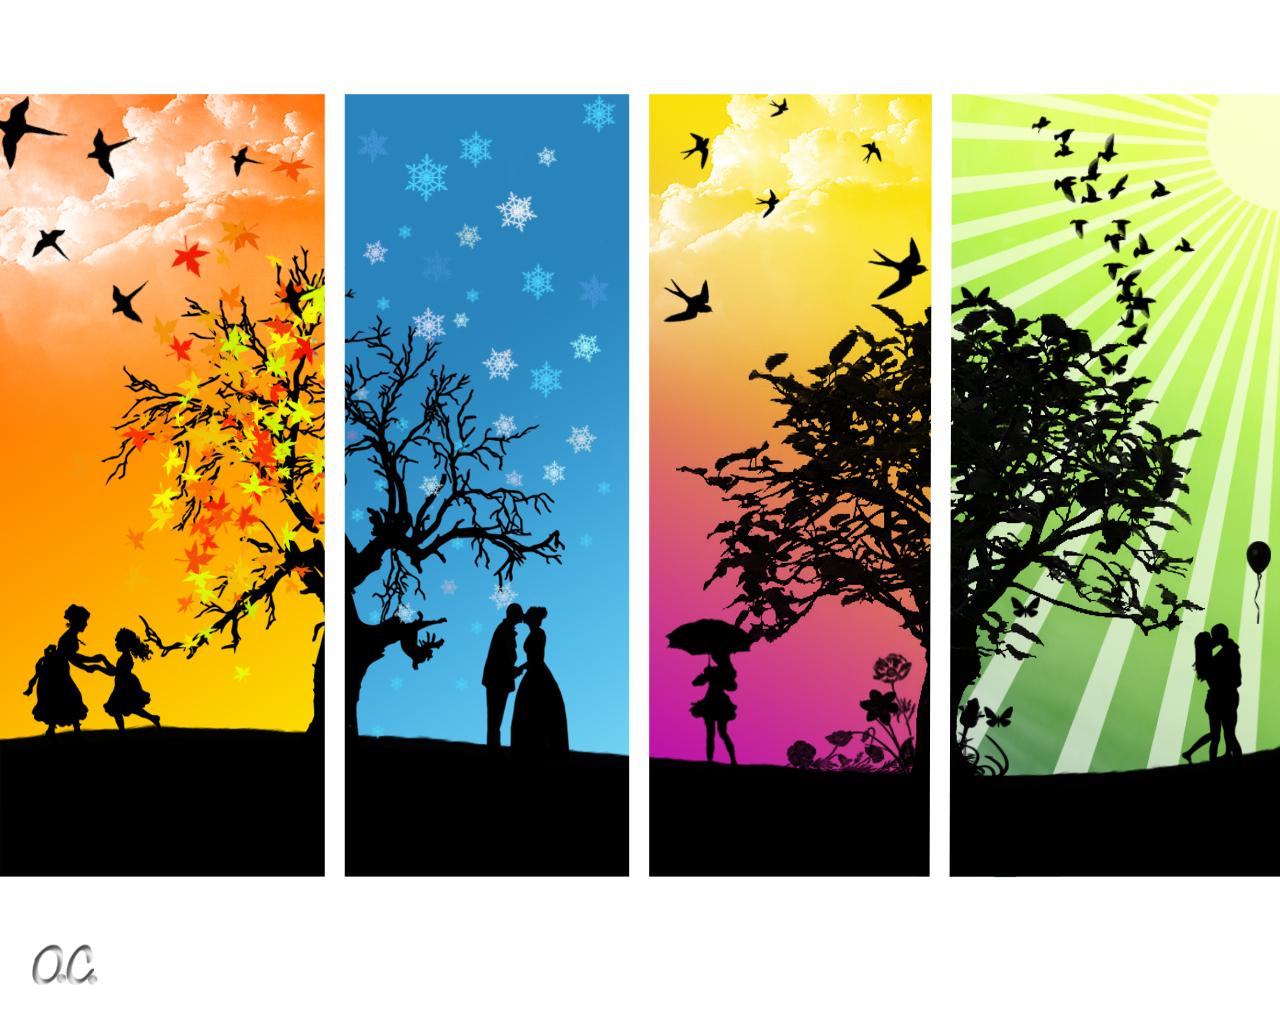 HD Quality Wallpaper | Collection: Artistic, 1280x1024 Season